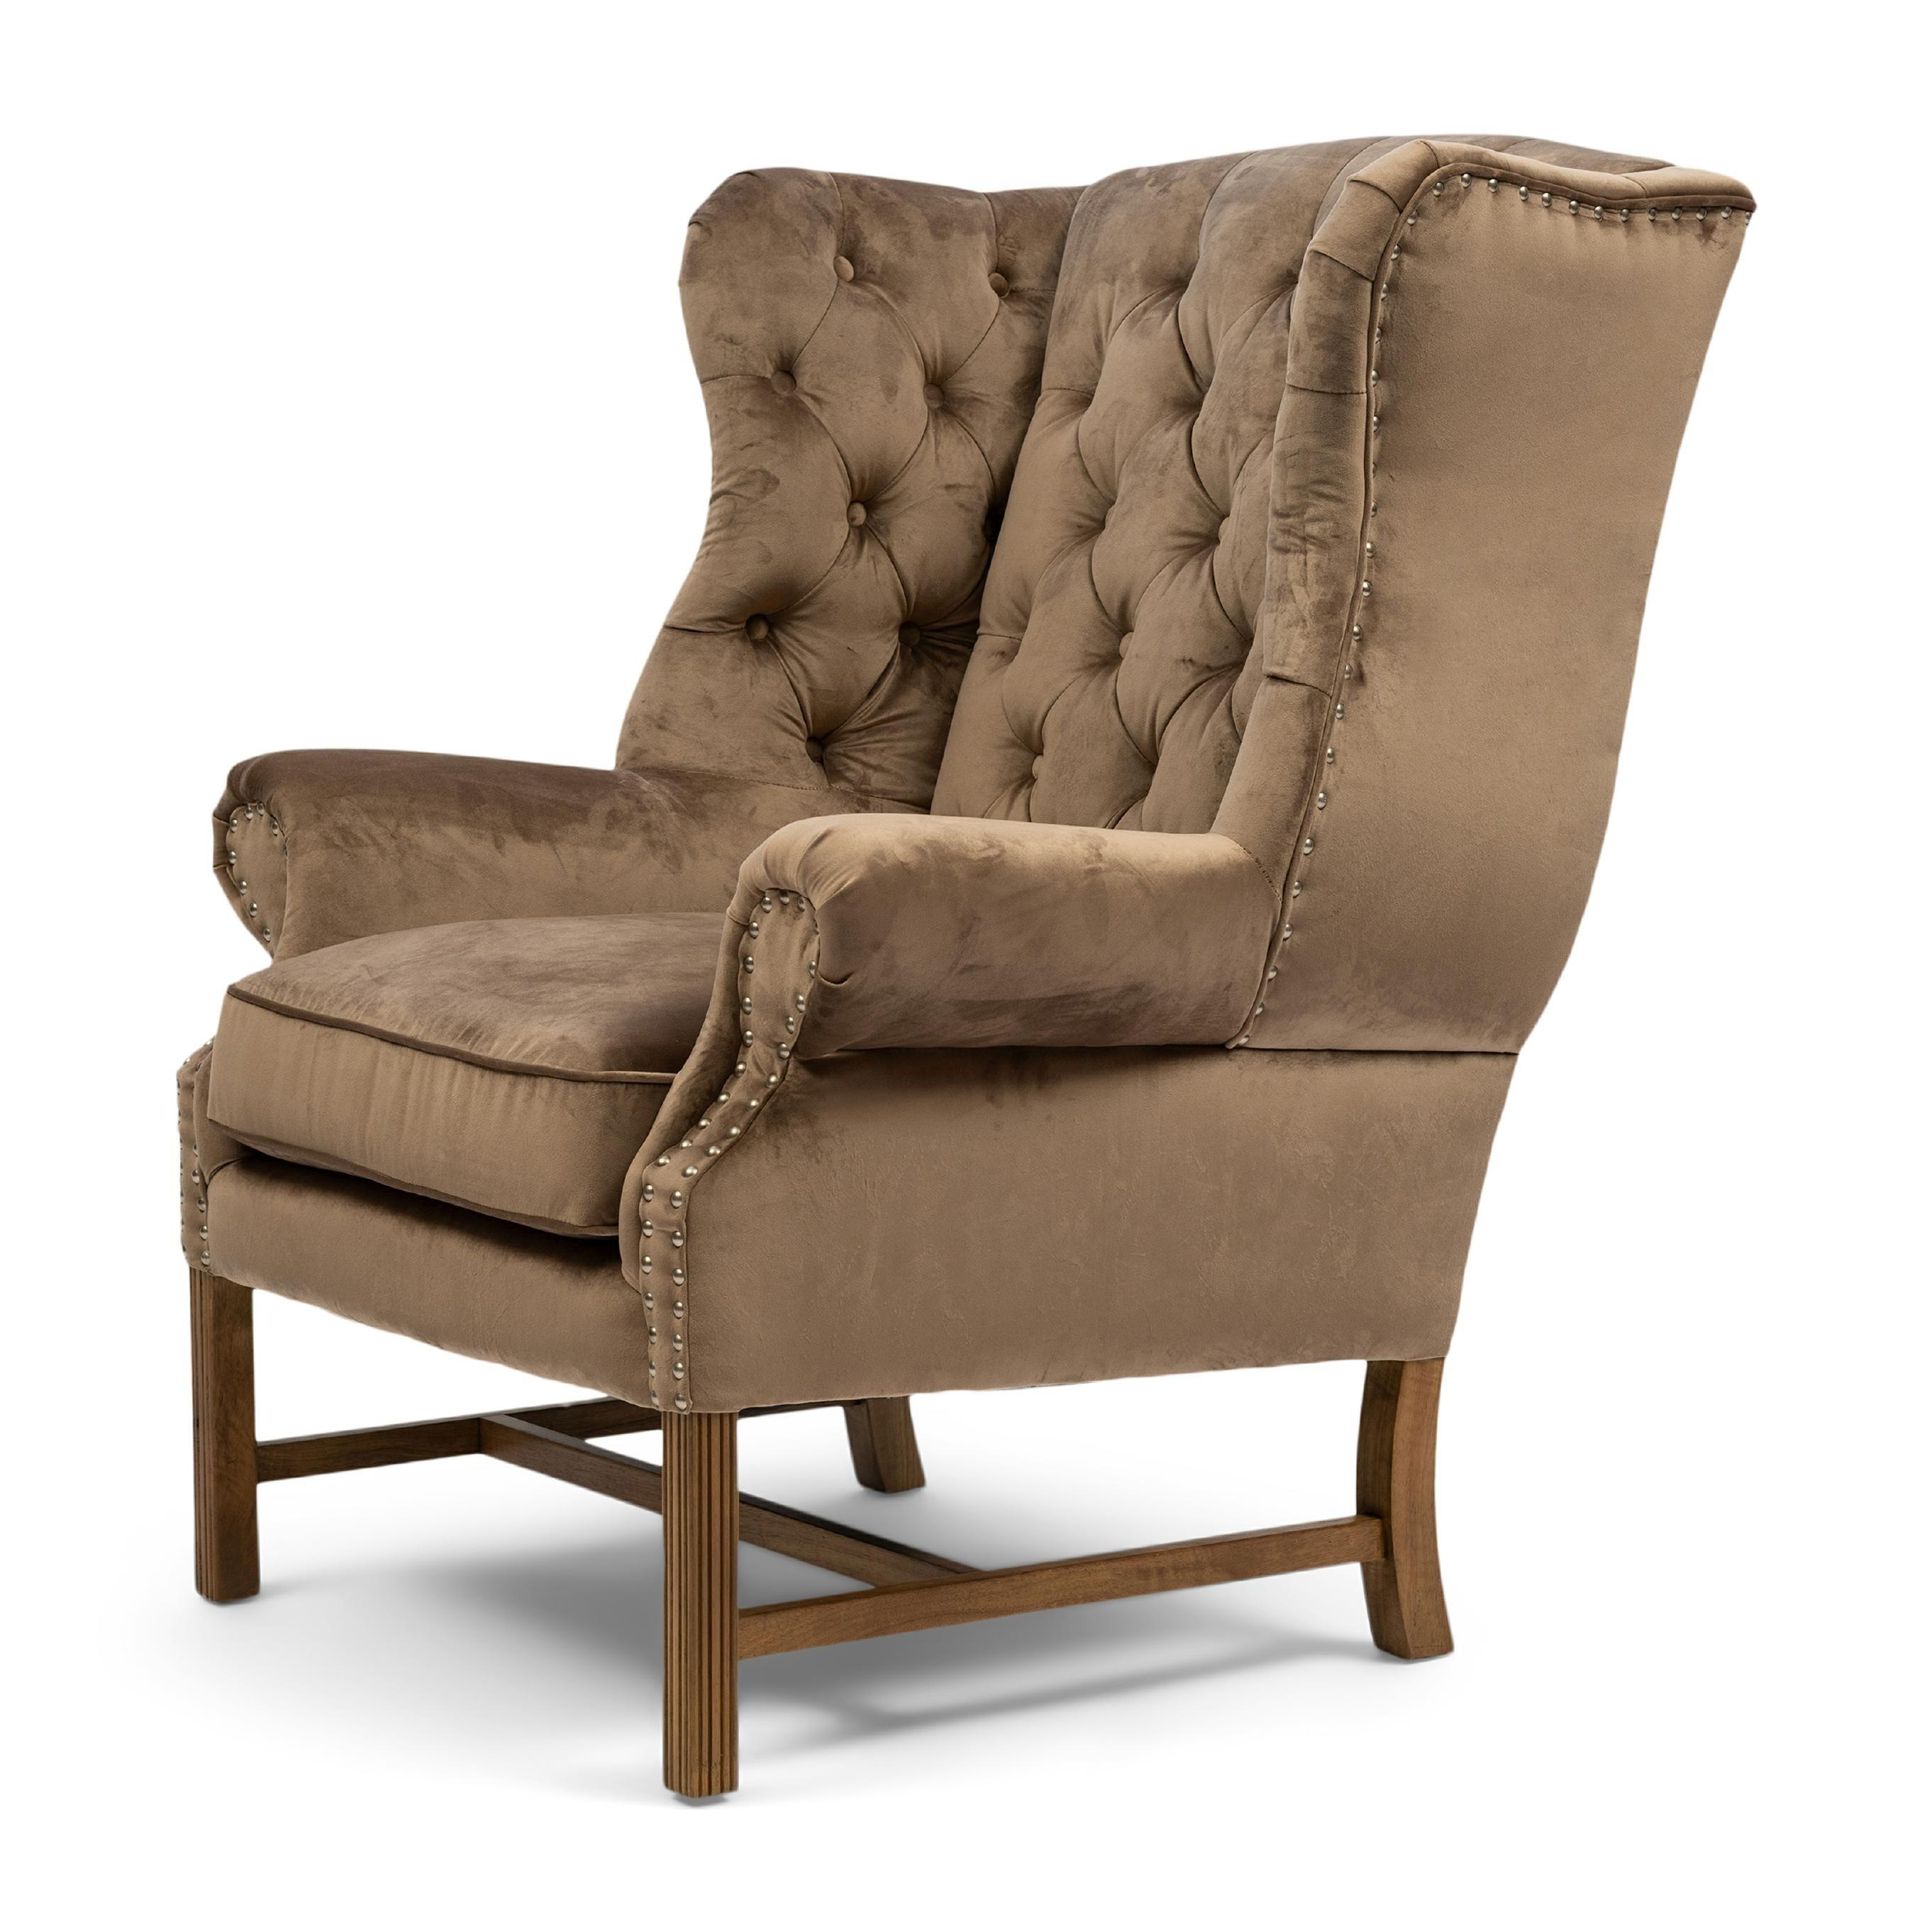 Franklin Park Wing Chair velvet III golden mink / Rivièra Maison